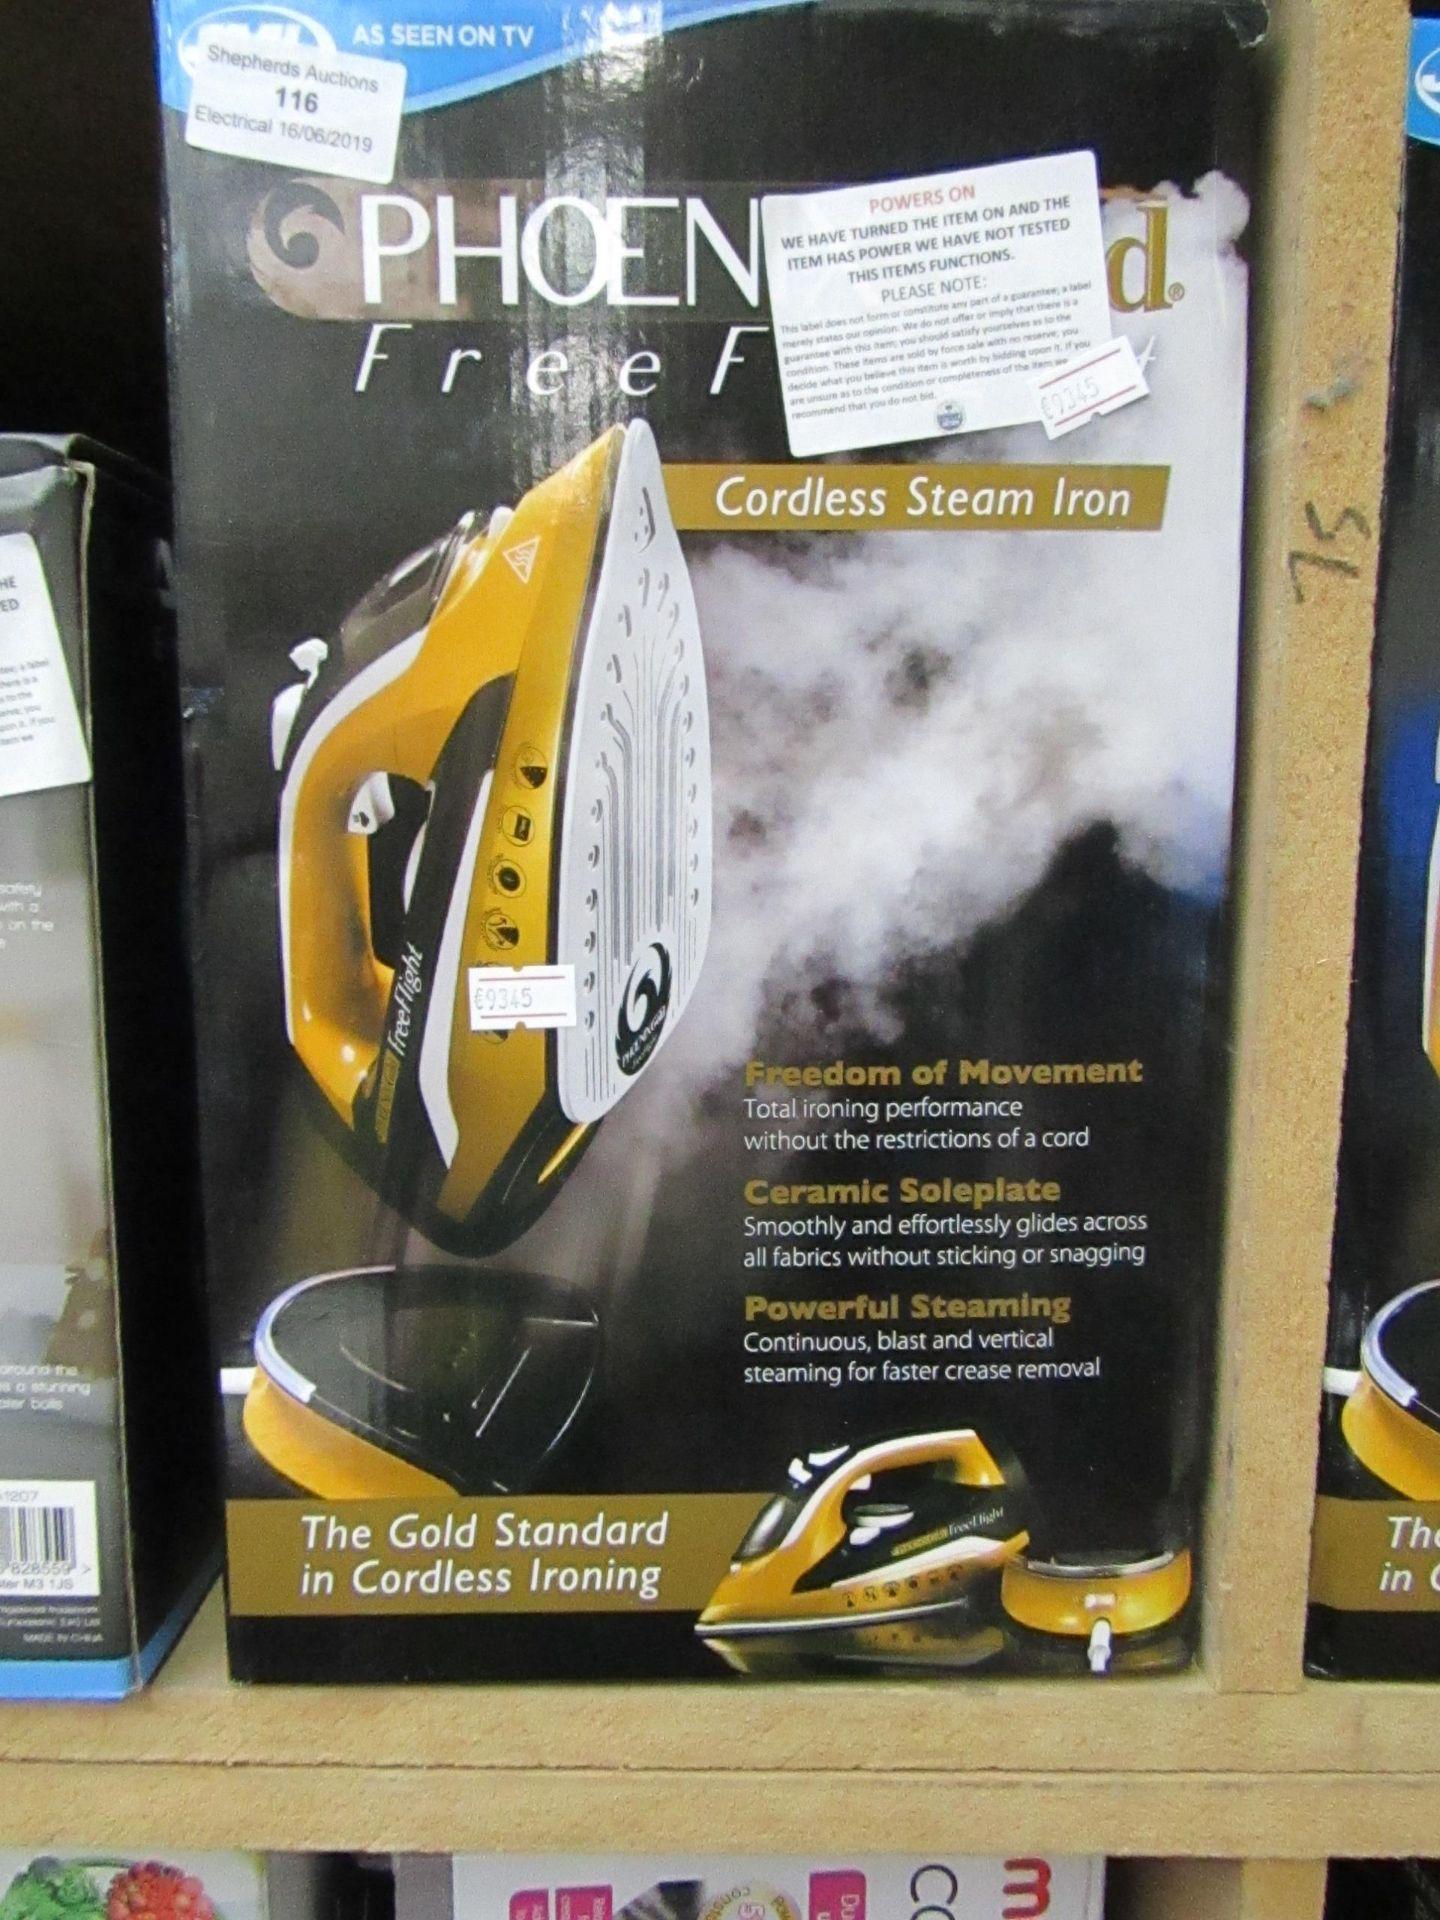 Lot 116 - JML Phoenix Gold Free Flight cordless steam iron, powers on and boxed.